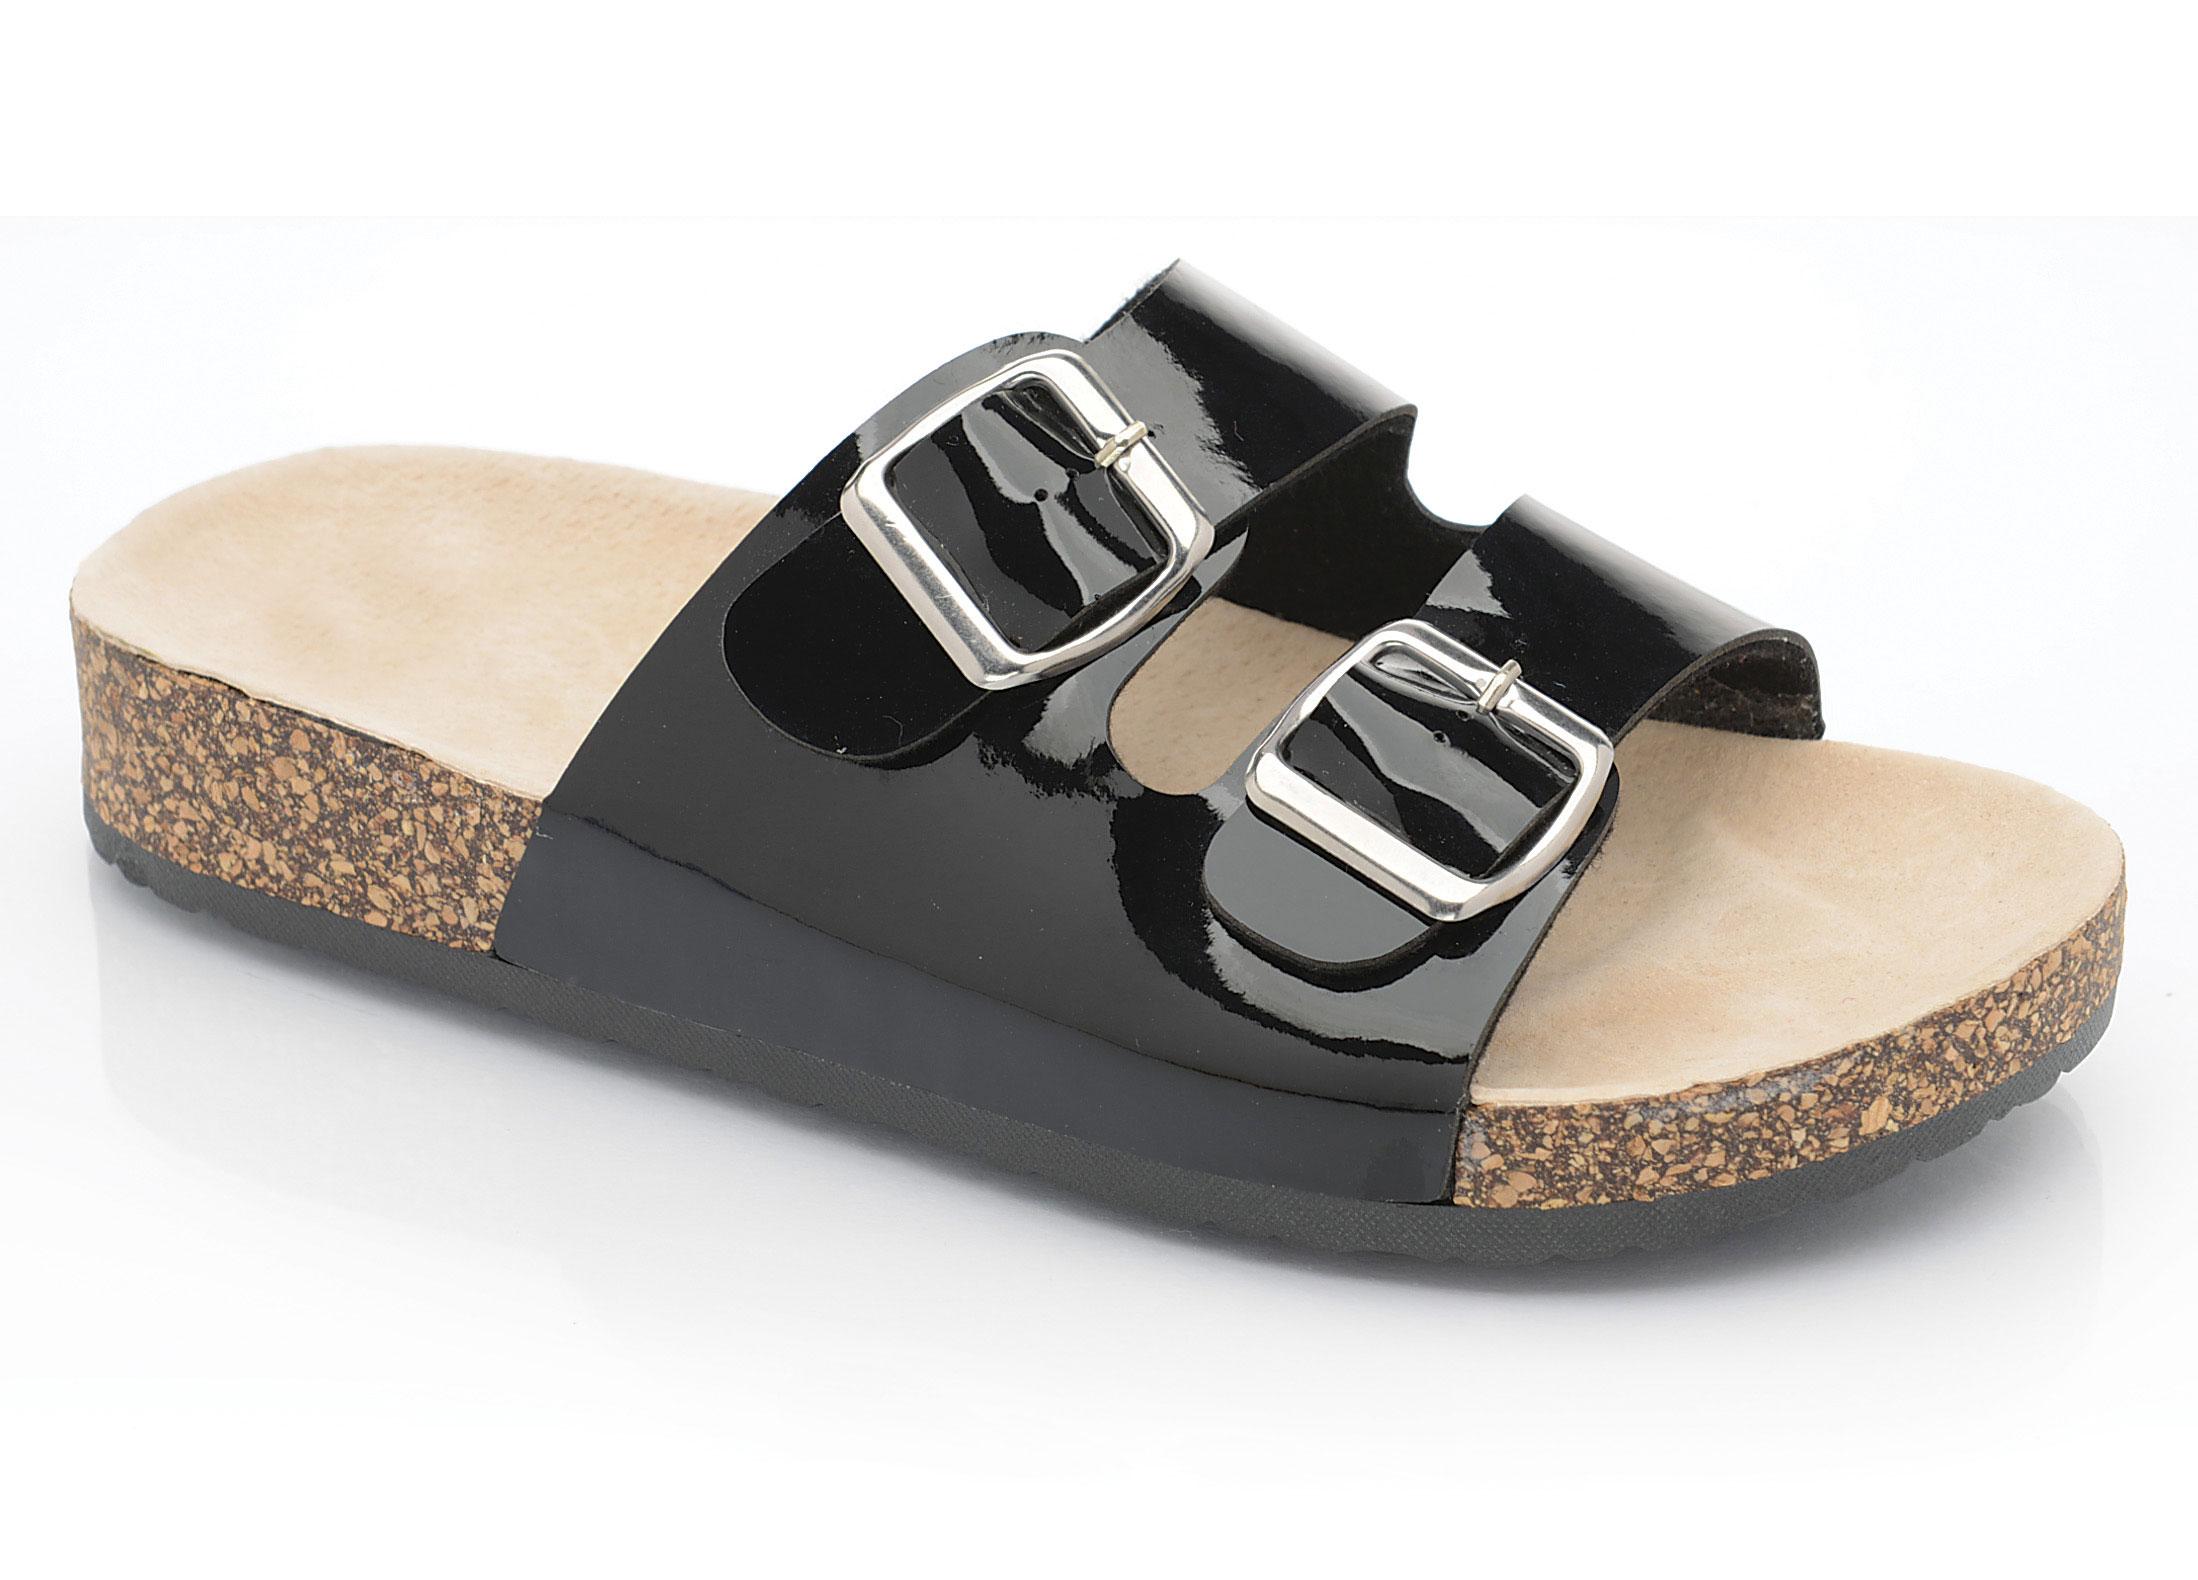 Sandals shoes summer - Ladies Womens Flat Sandals Summer Comfort Cork Sole